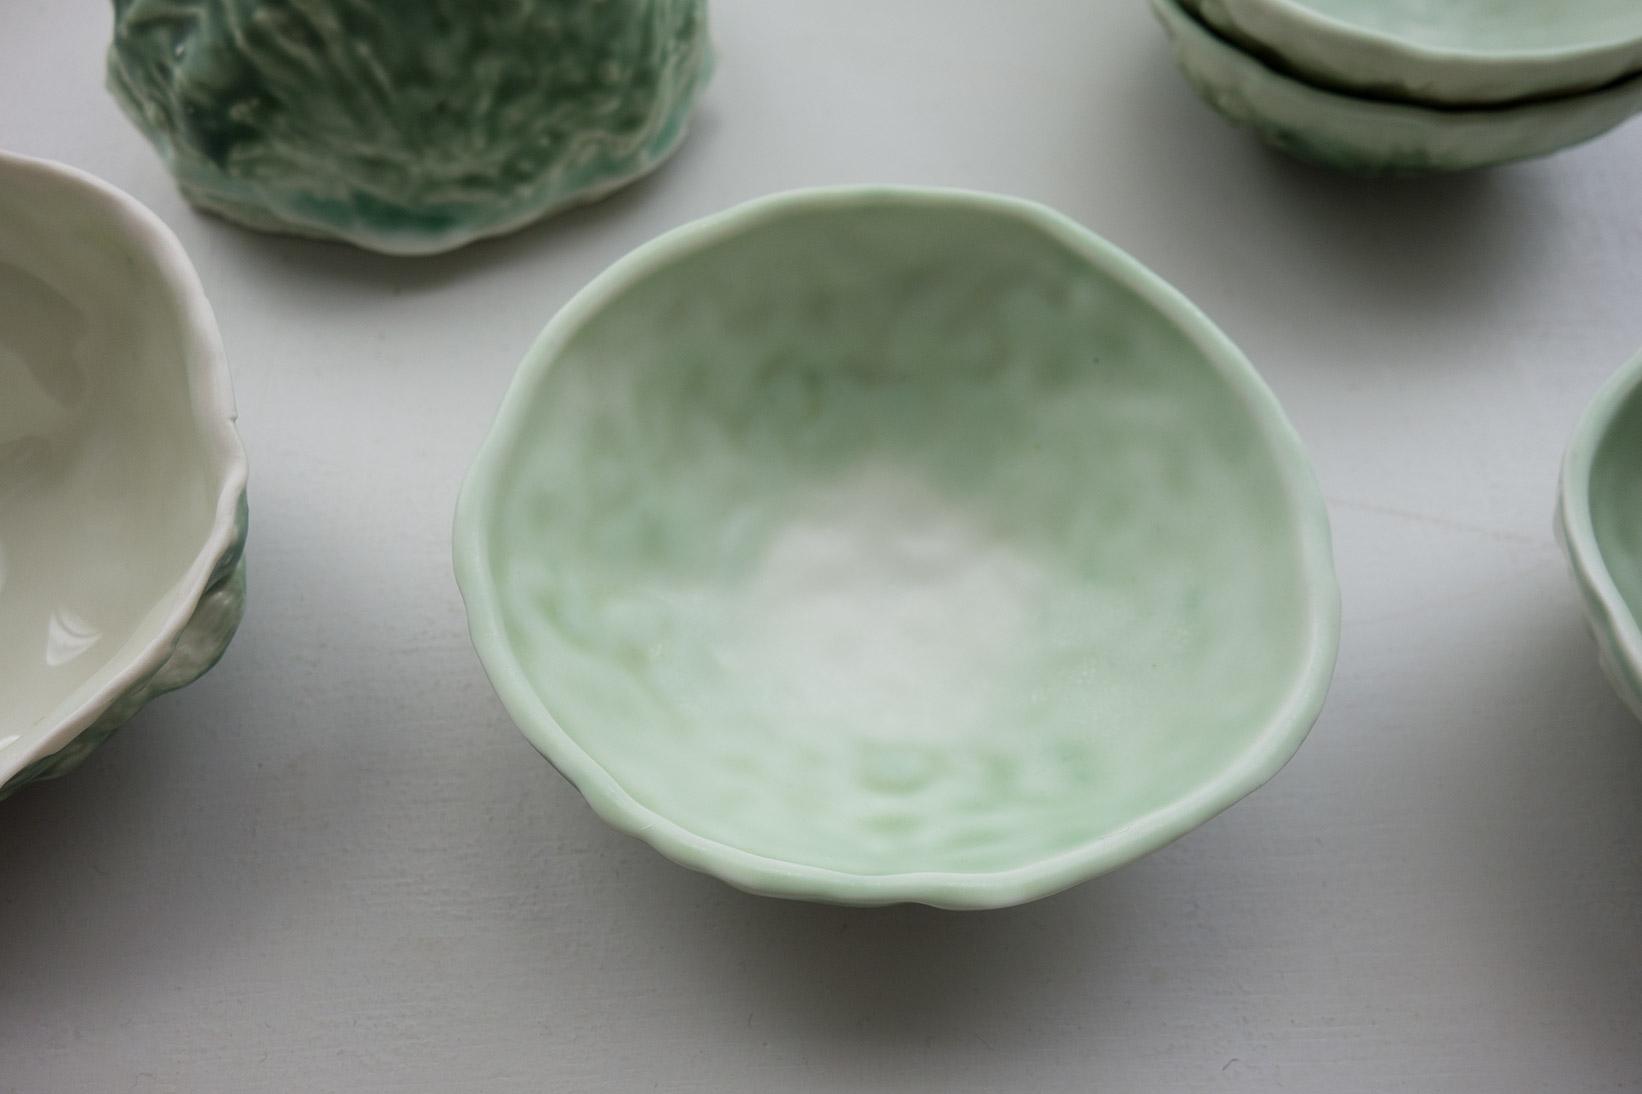 porcelaine émaillée / glazed porcelain